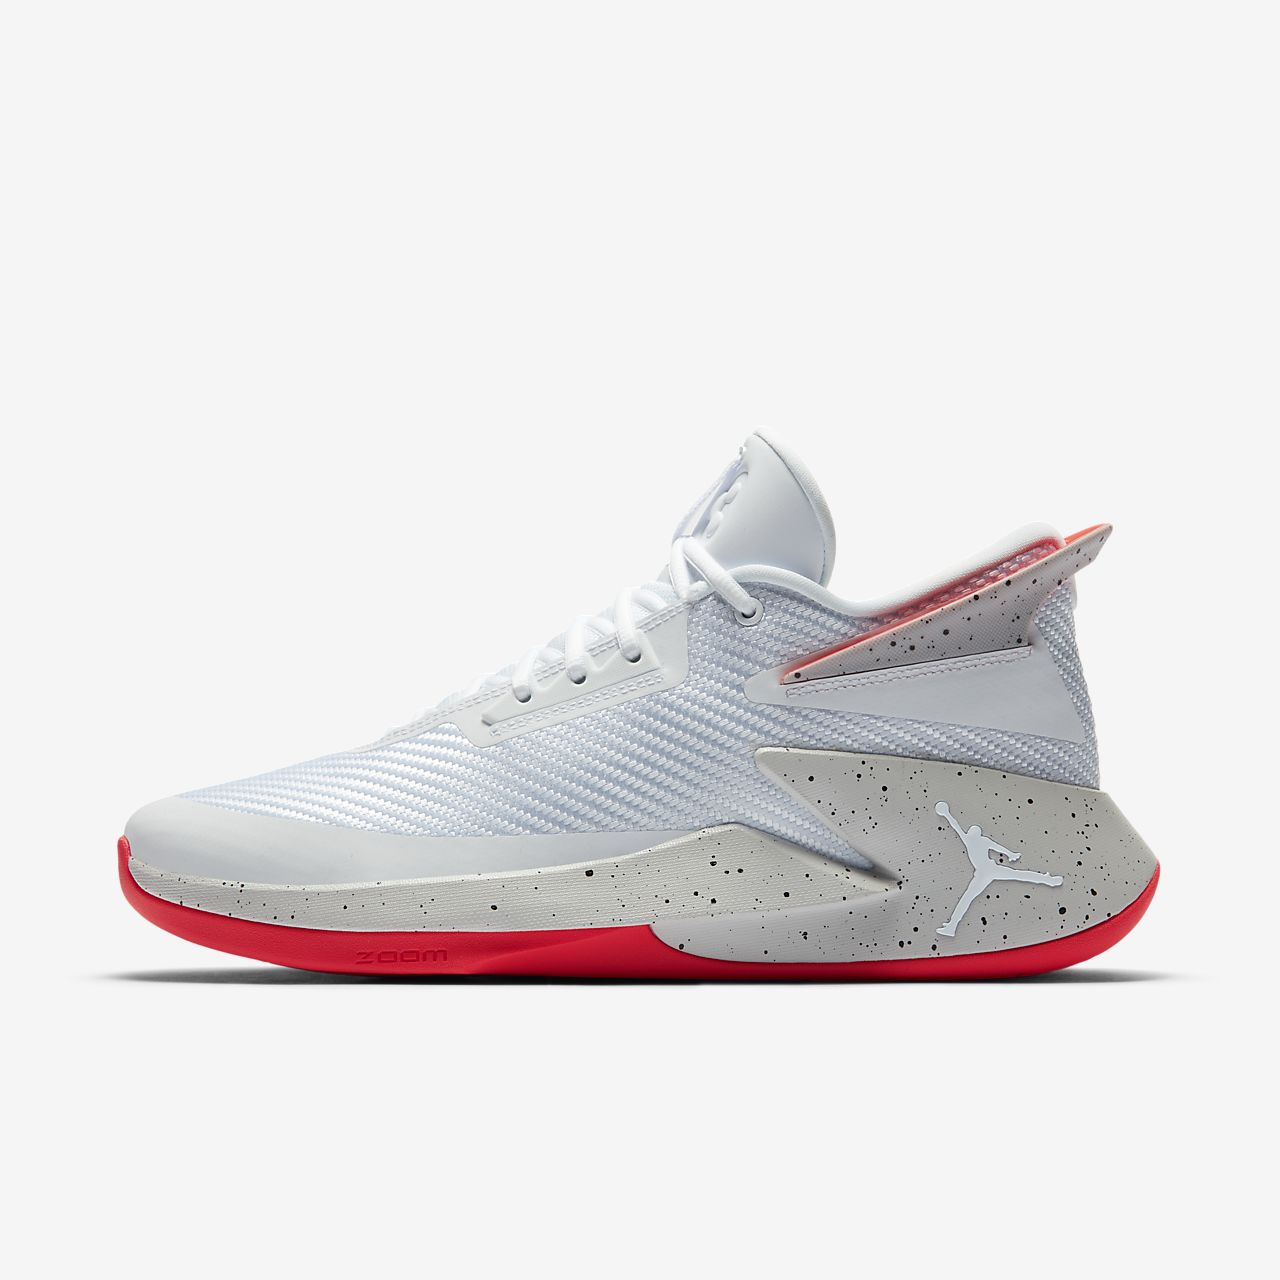 official photos 99e9a 9cd15 Chaussure de basketball Jordan Fly Lockdown pour Homme ...